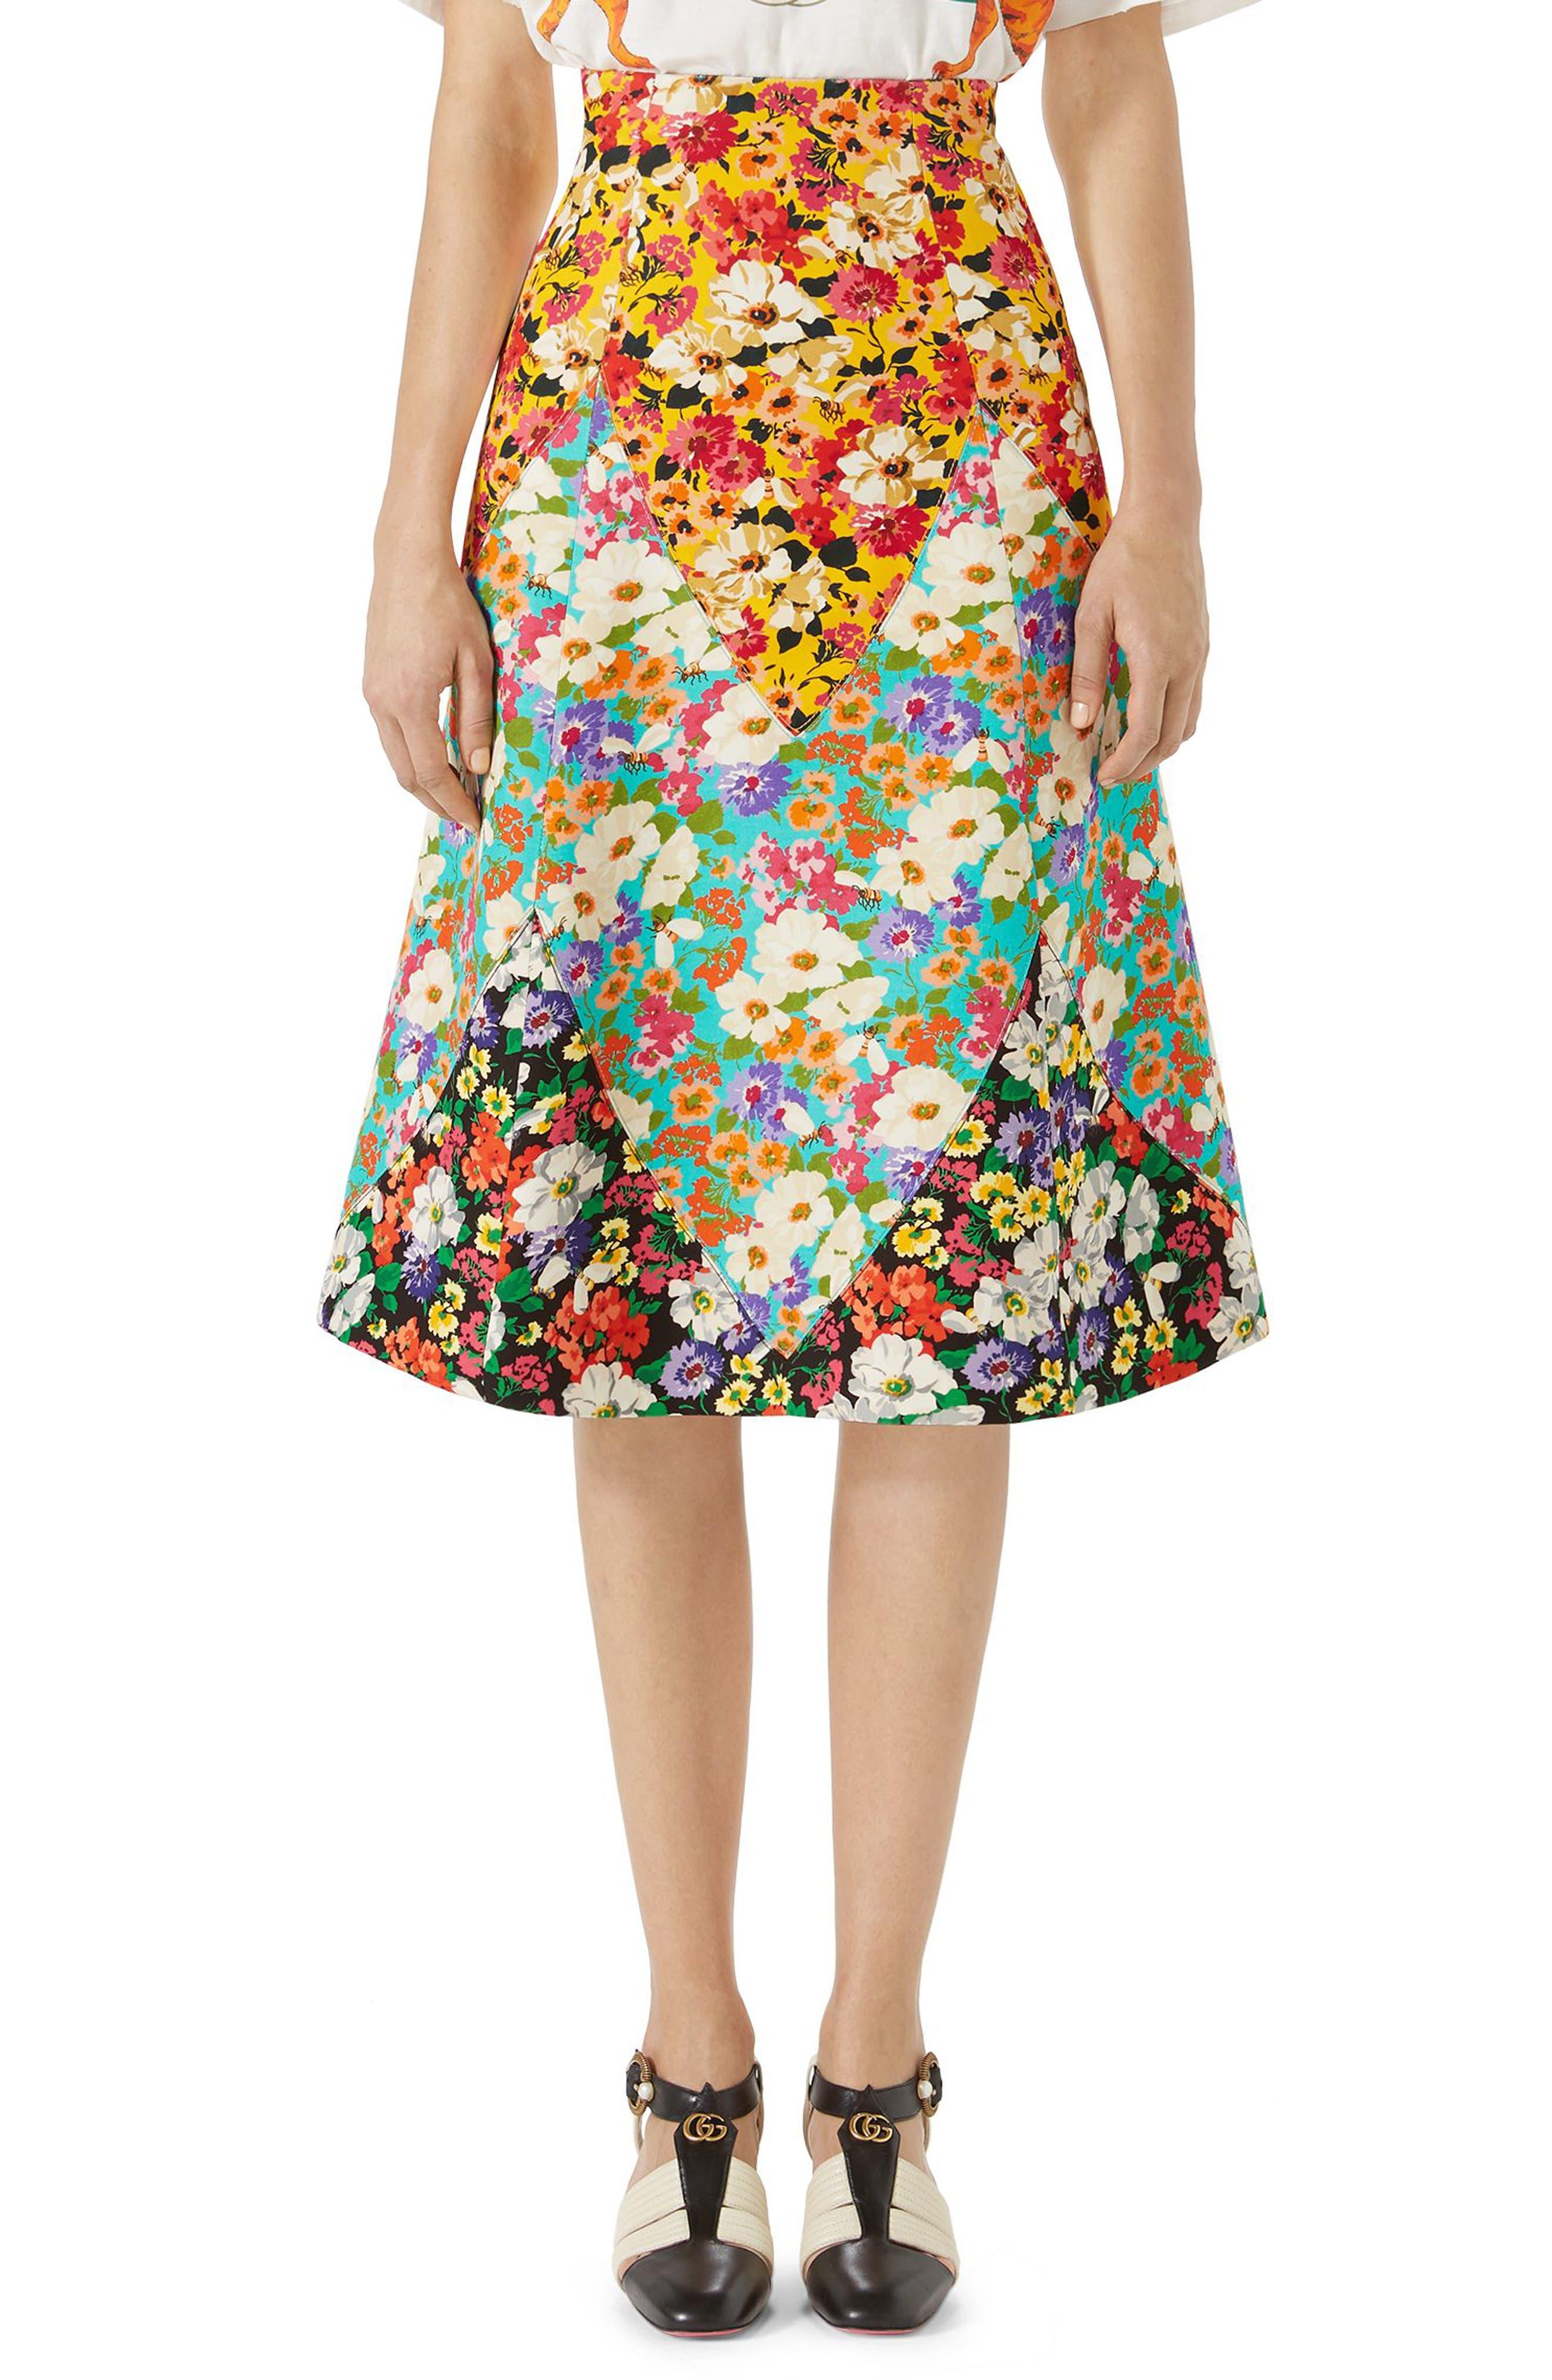 Gucci Floral Print Cady A-Line Skirt